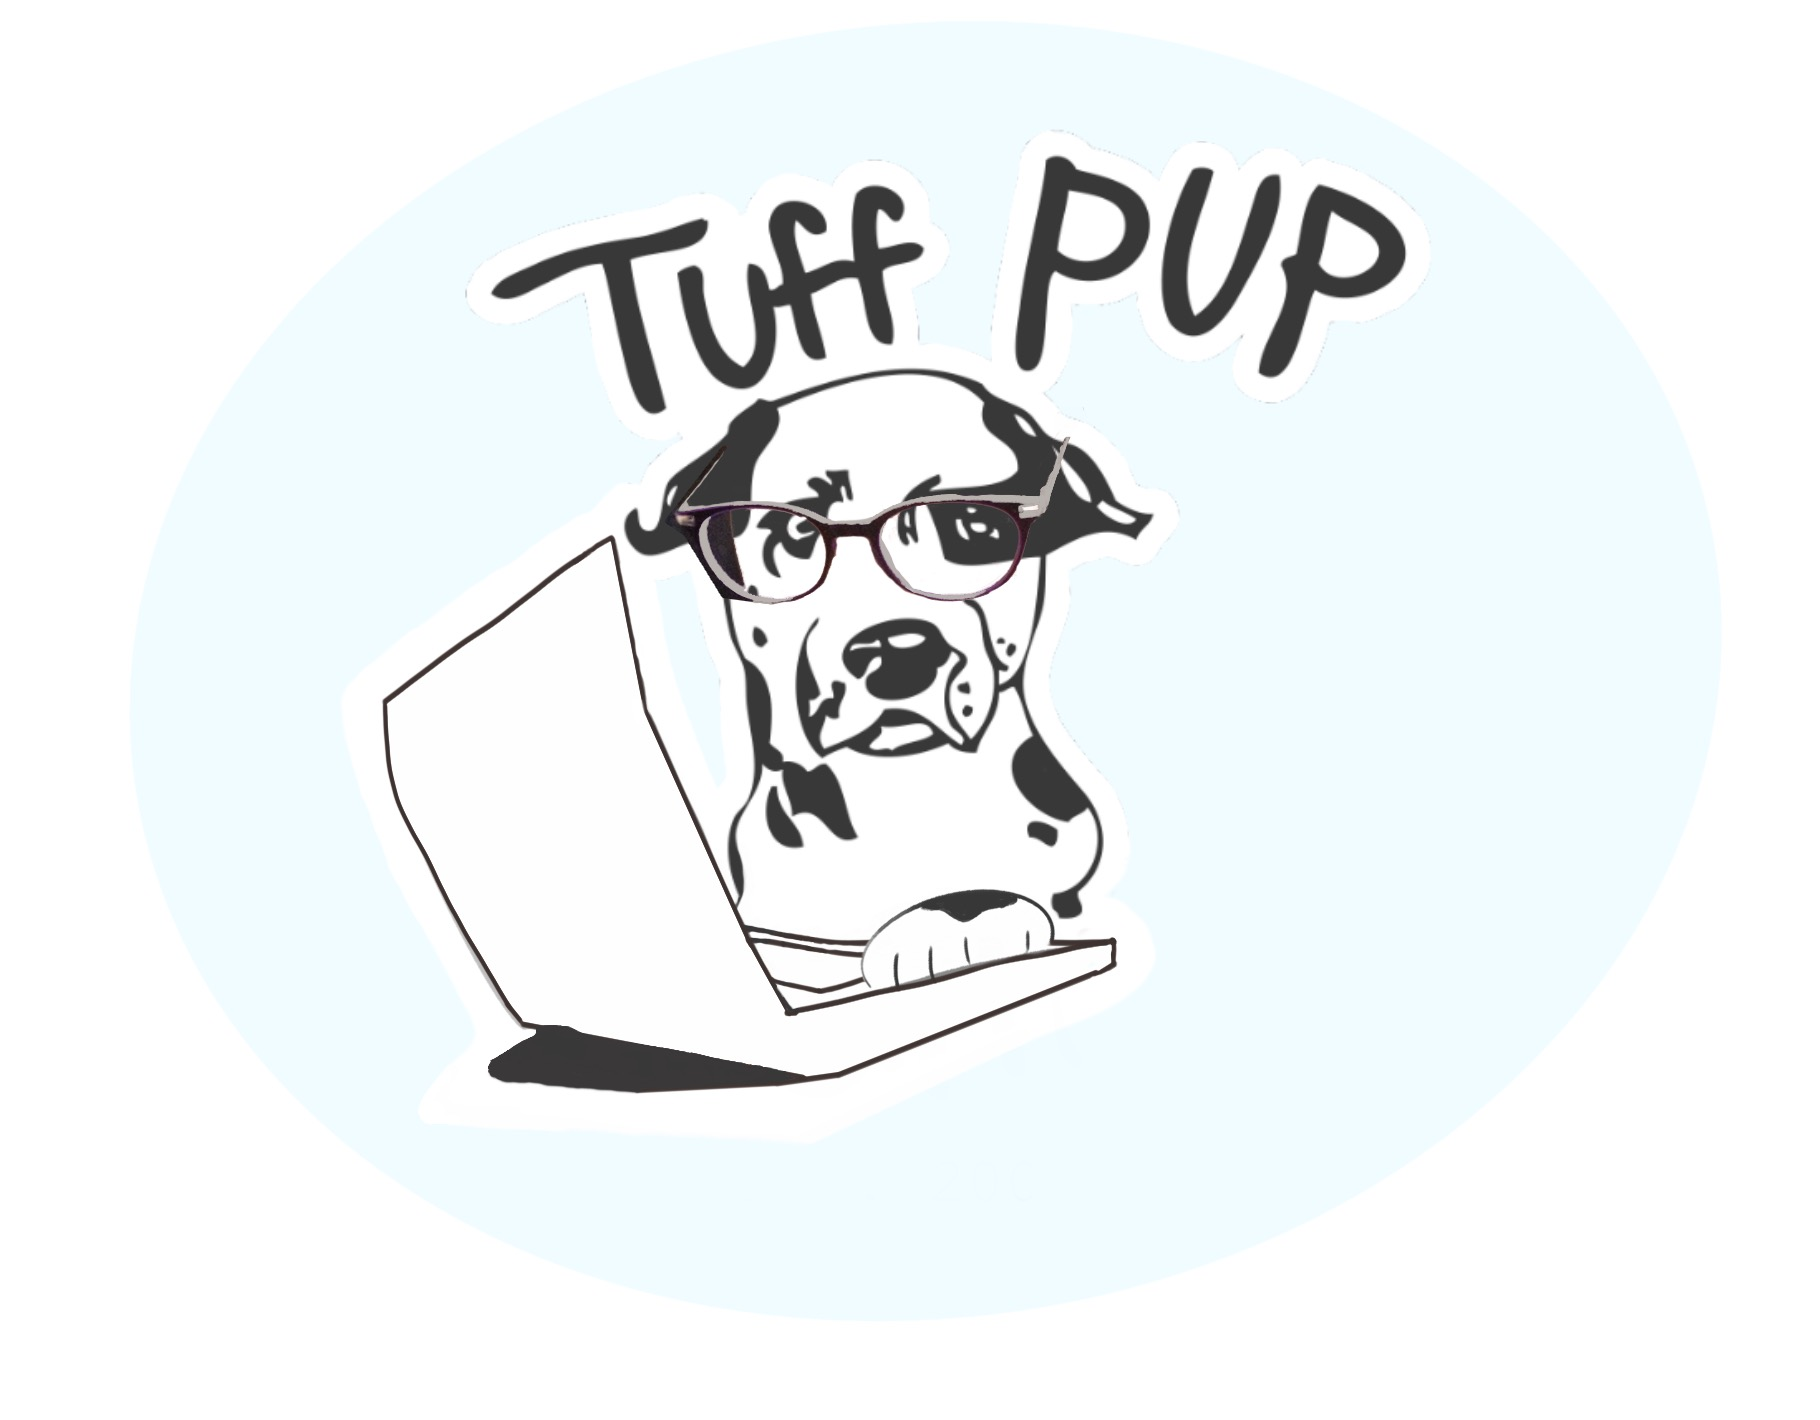 Blog pup Tuff Pup5.jpg